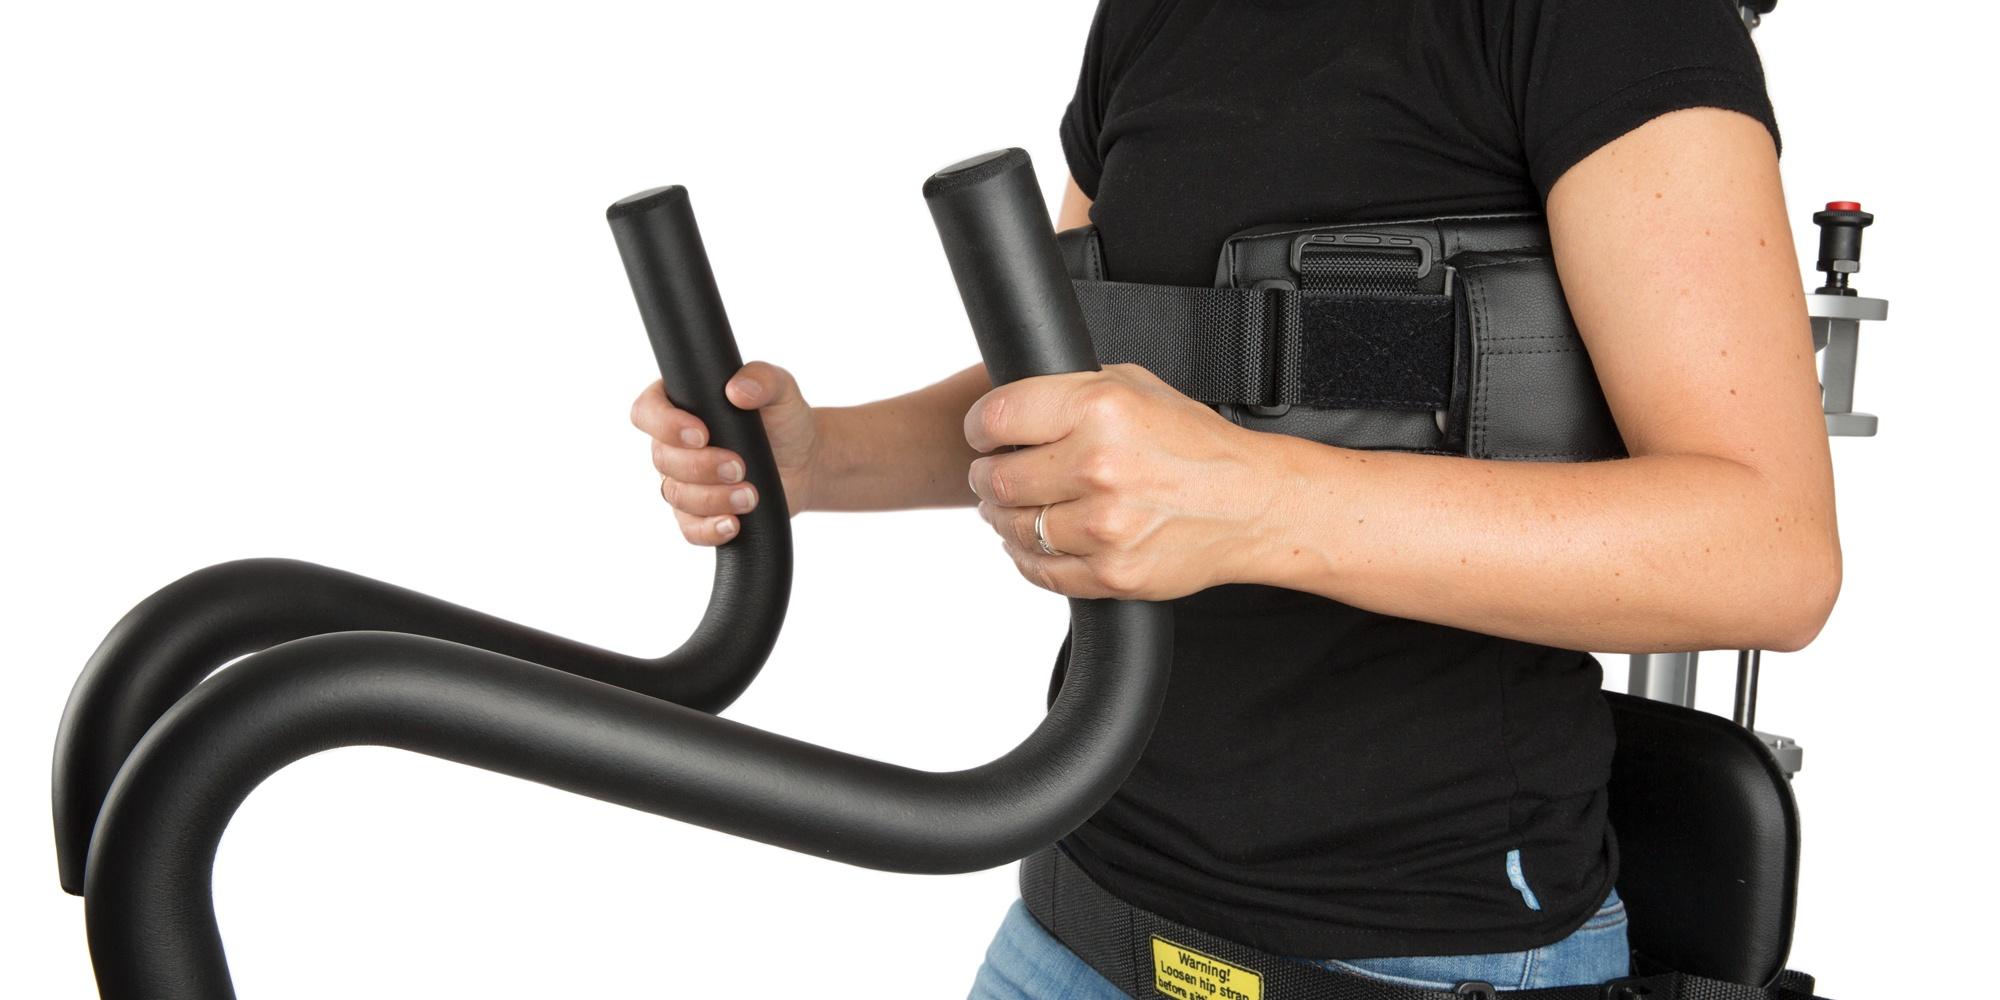 Arm-movement-handles